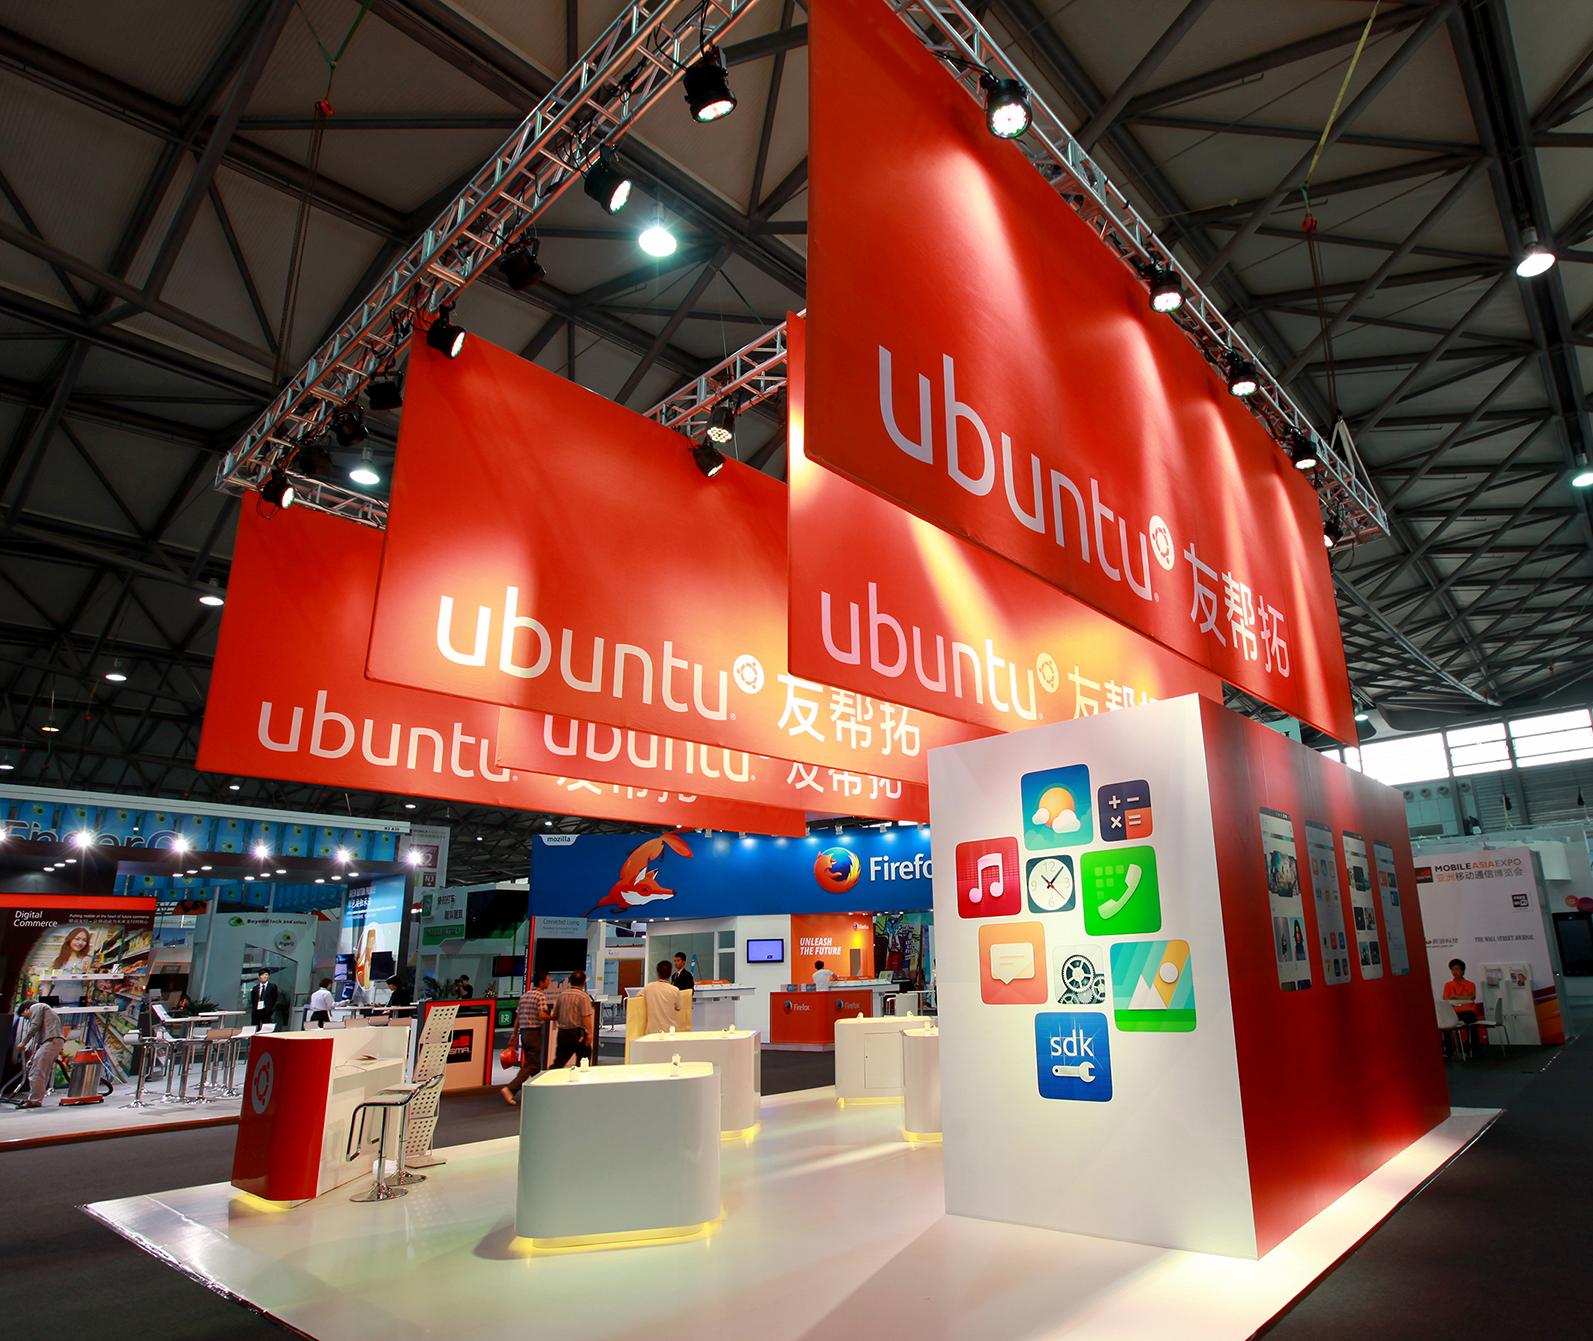 Shanghai Mobile Asia Expo Ubuntu Exhibition Stand